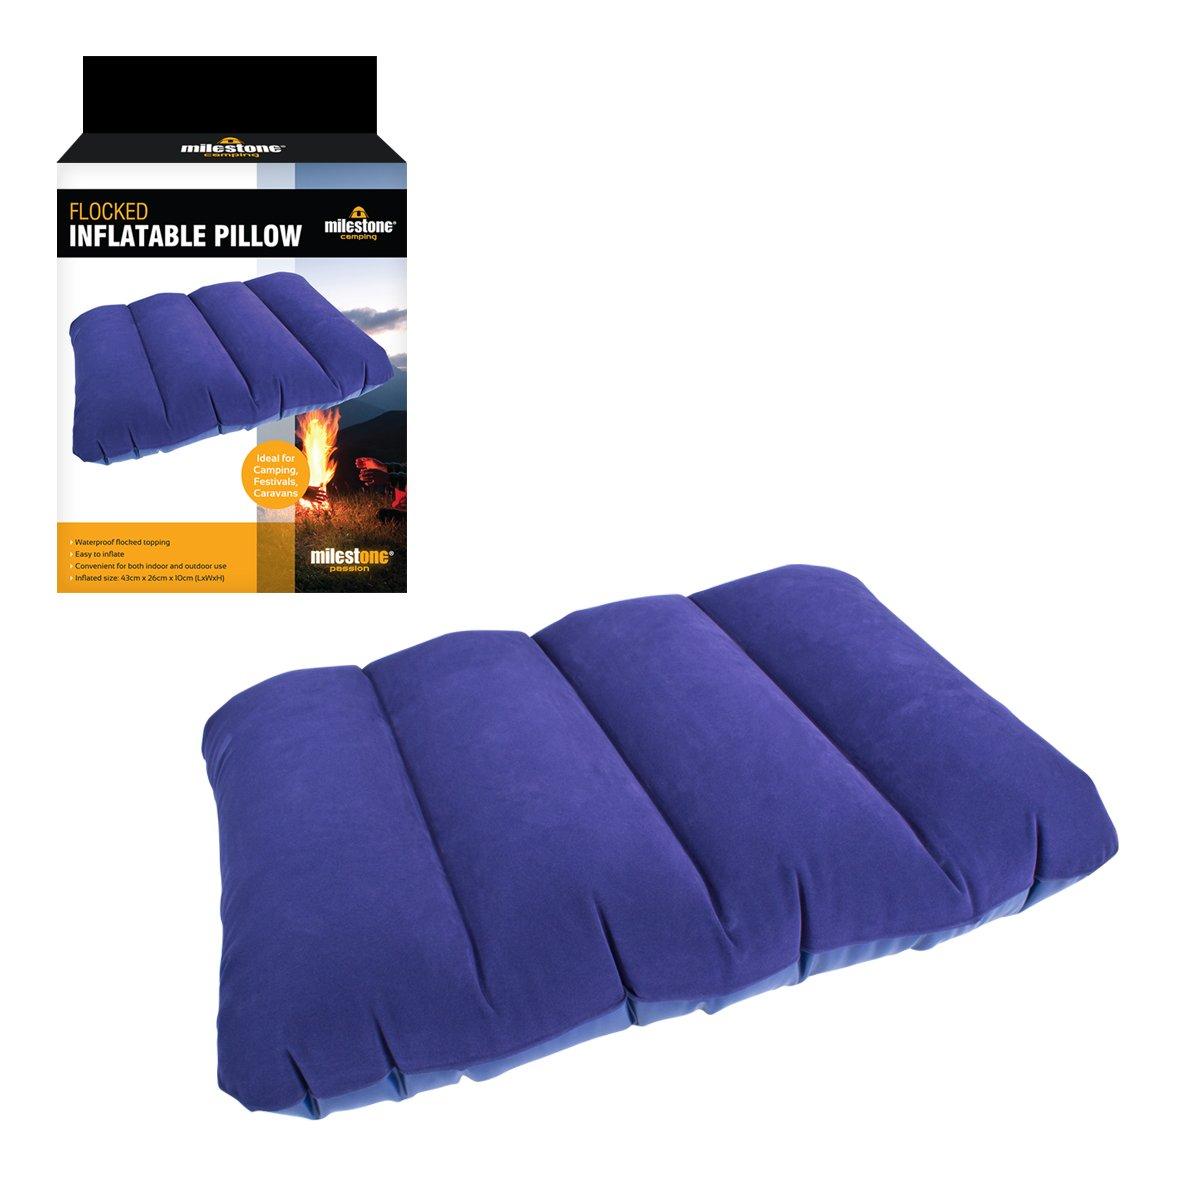 Almohada de viaje inflable Milestone Camping - Azul Benross Rect-Plw-2